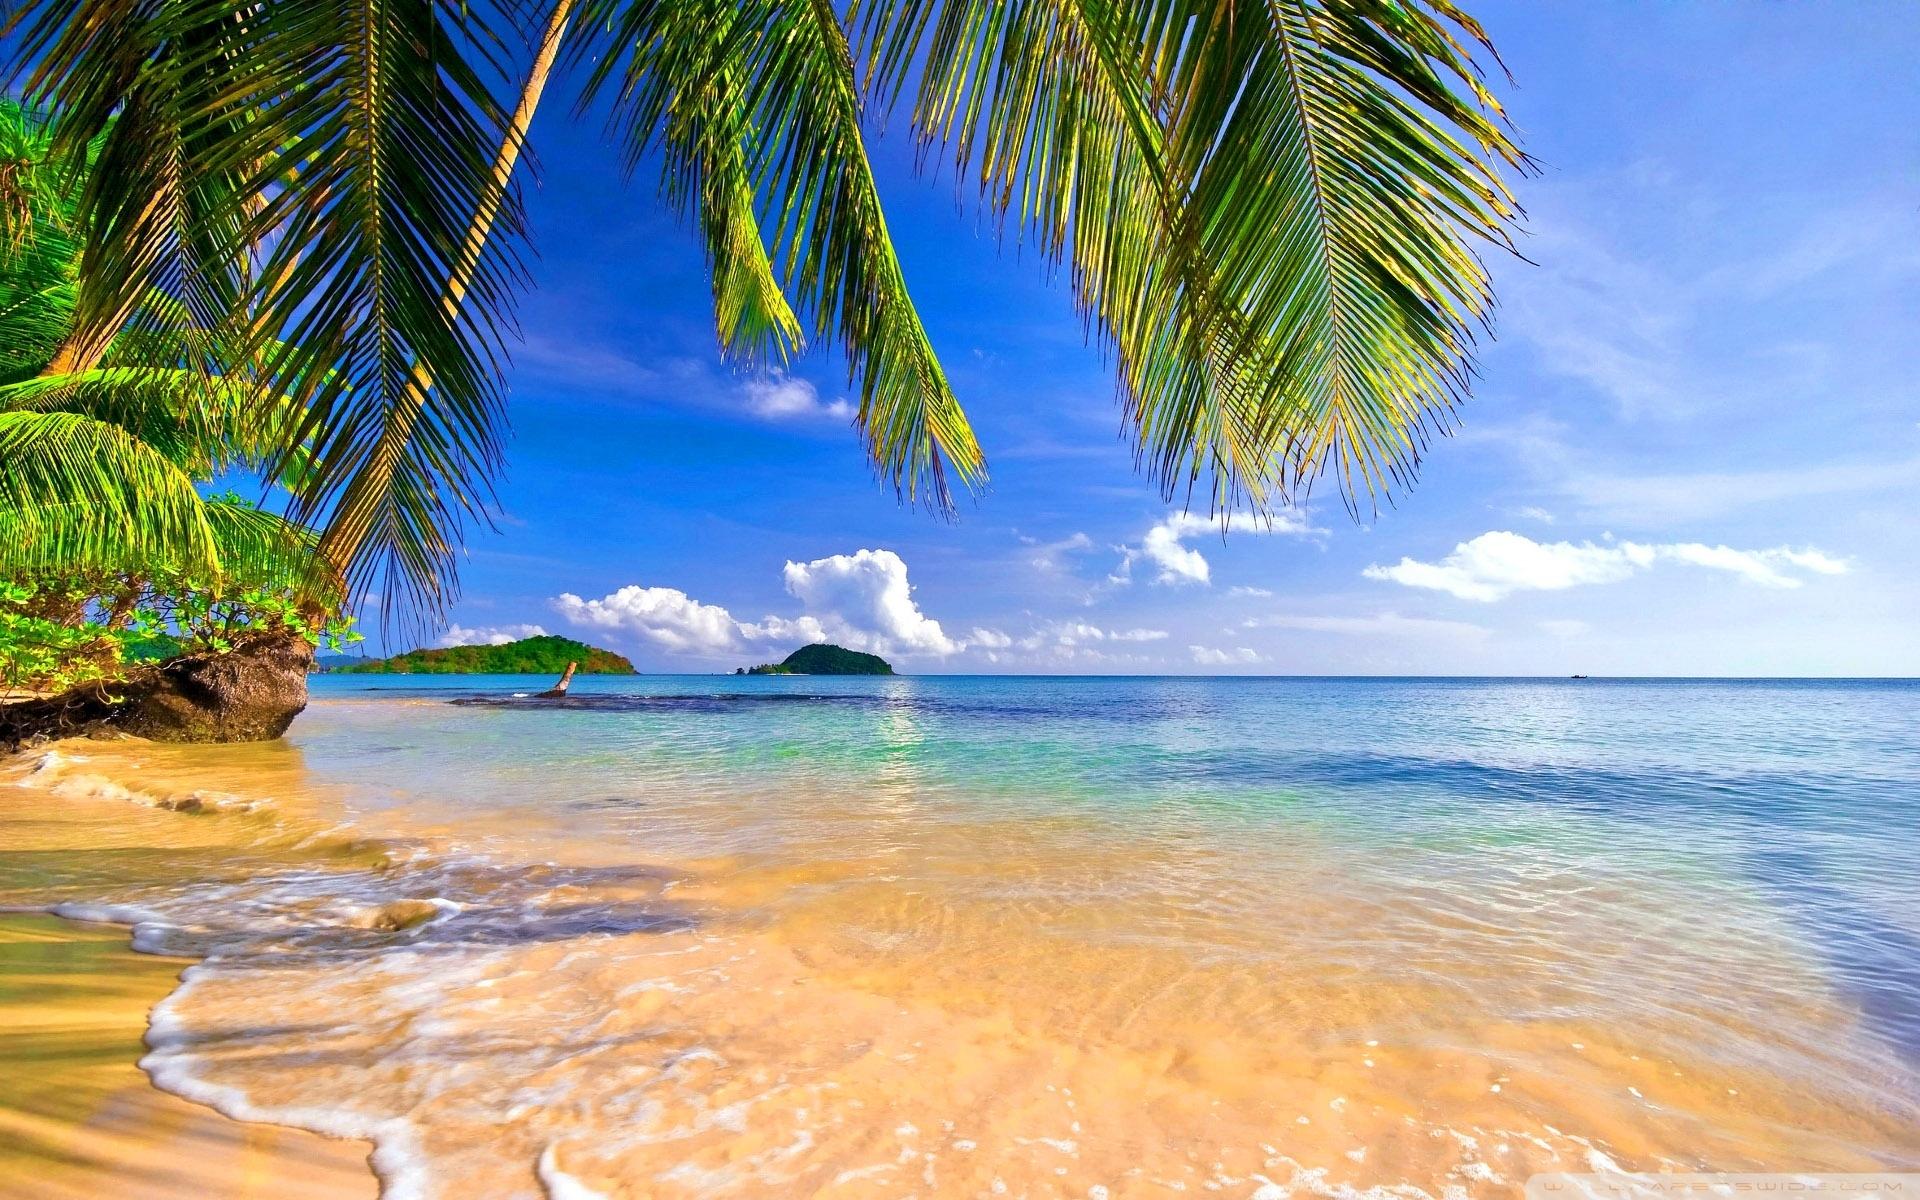 Tropical Island Desktop Wallpapers background